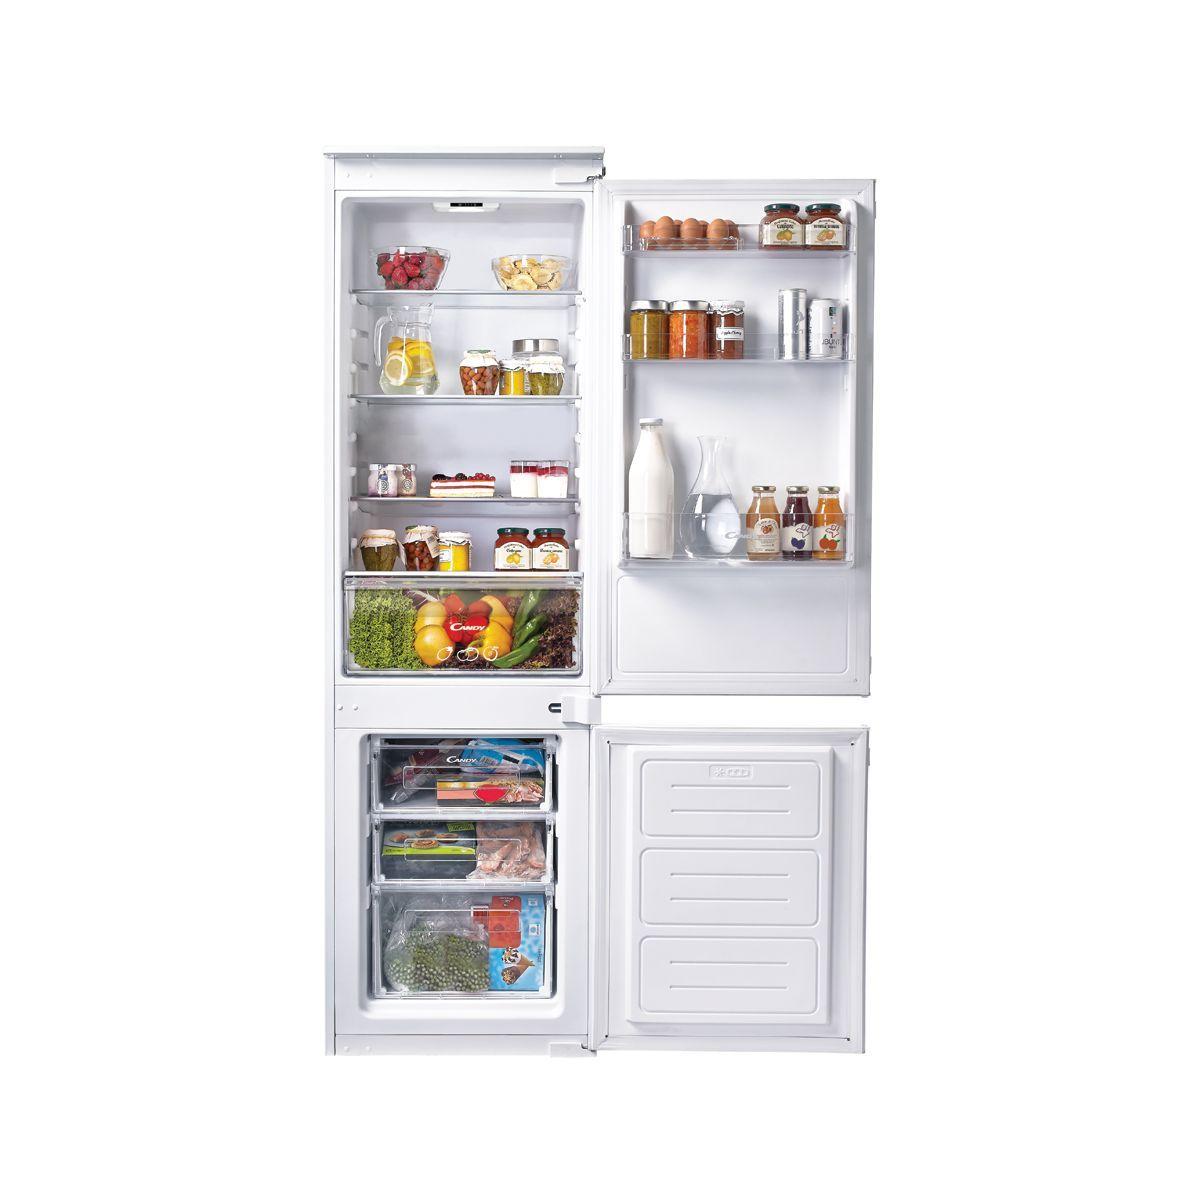 Refrigerateur Integrable Congelateur En Bas Ckbbs100 Candy Webdistrib Com Congelation Frigo Refrigerateur